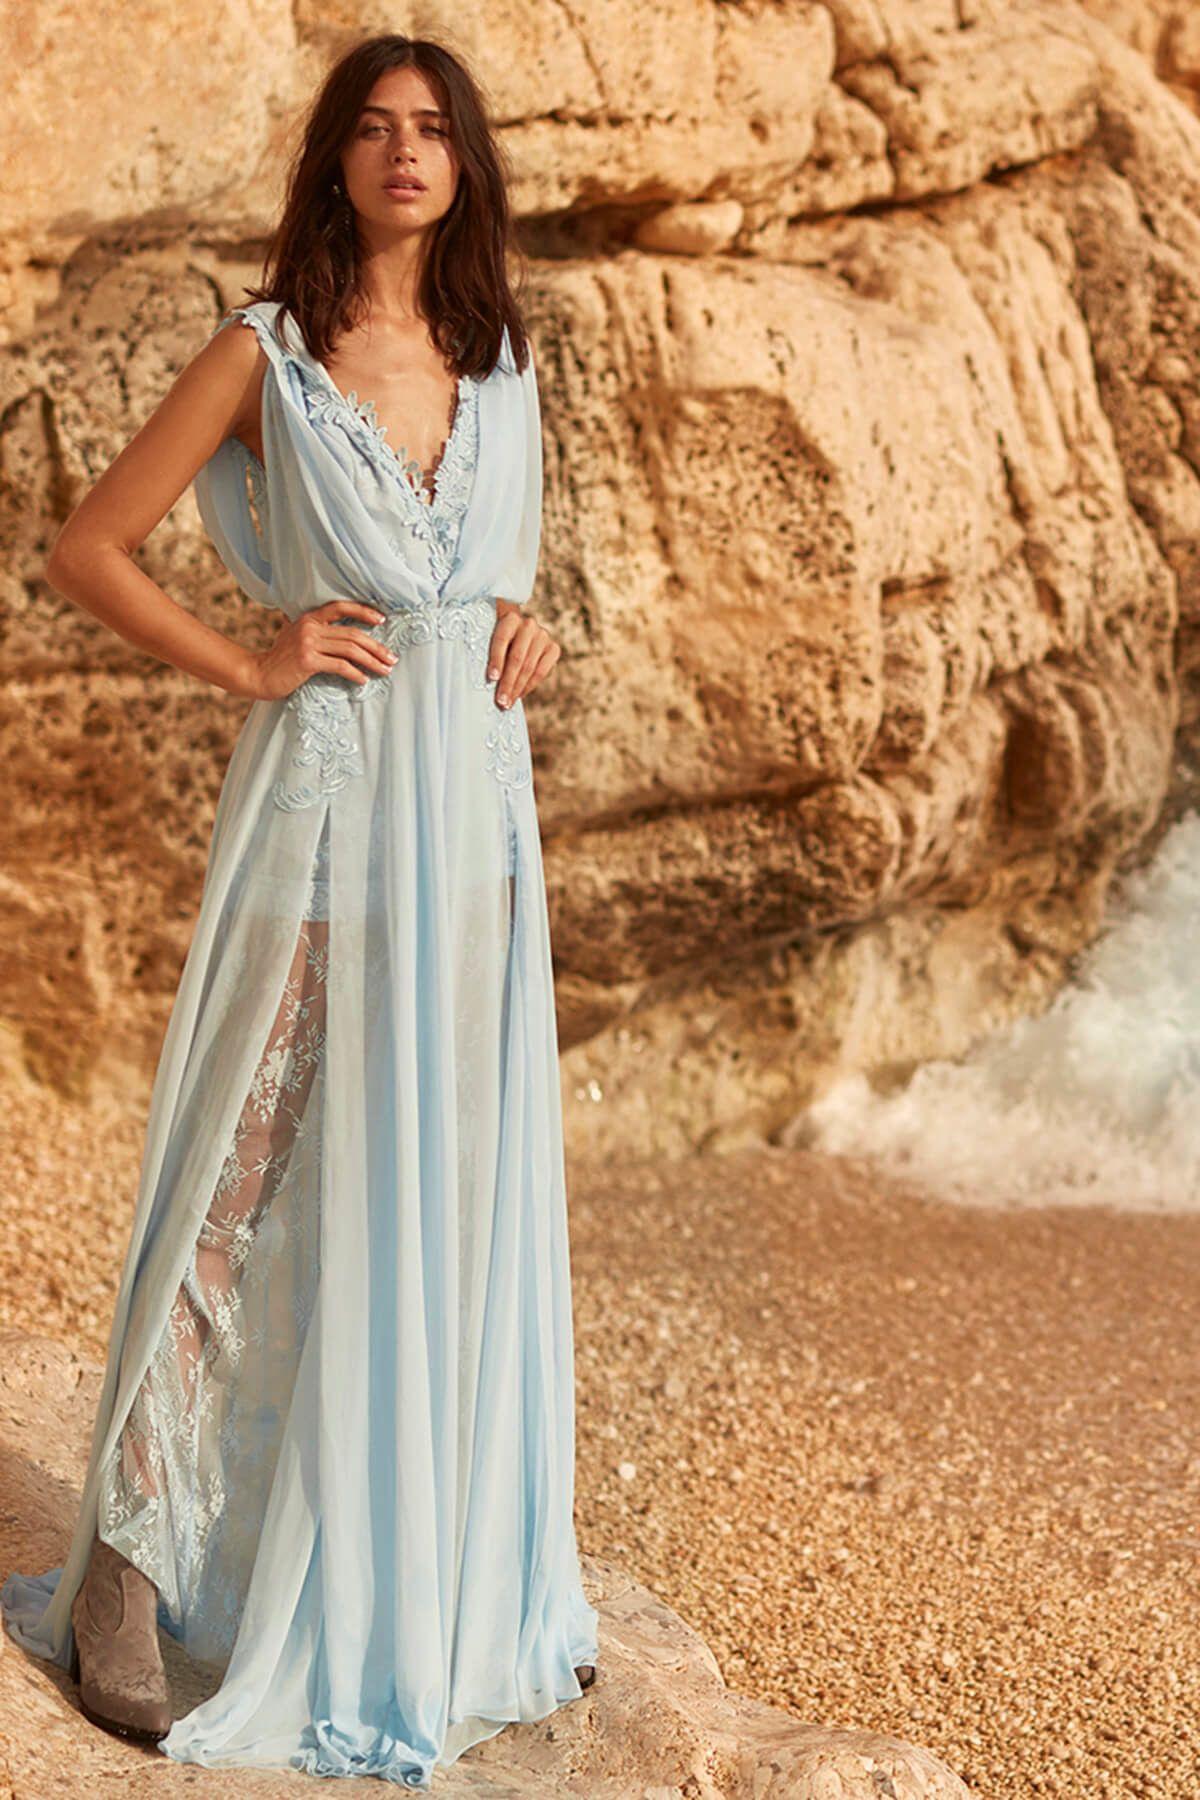 cdfb9661ec2c6 Tuvanam For Trendyol - Tuvanam For Trendyol Mavi Aplikeli Abiye Elbise